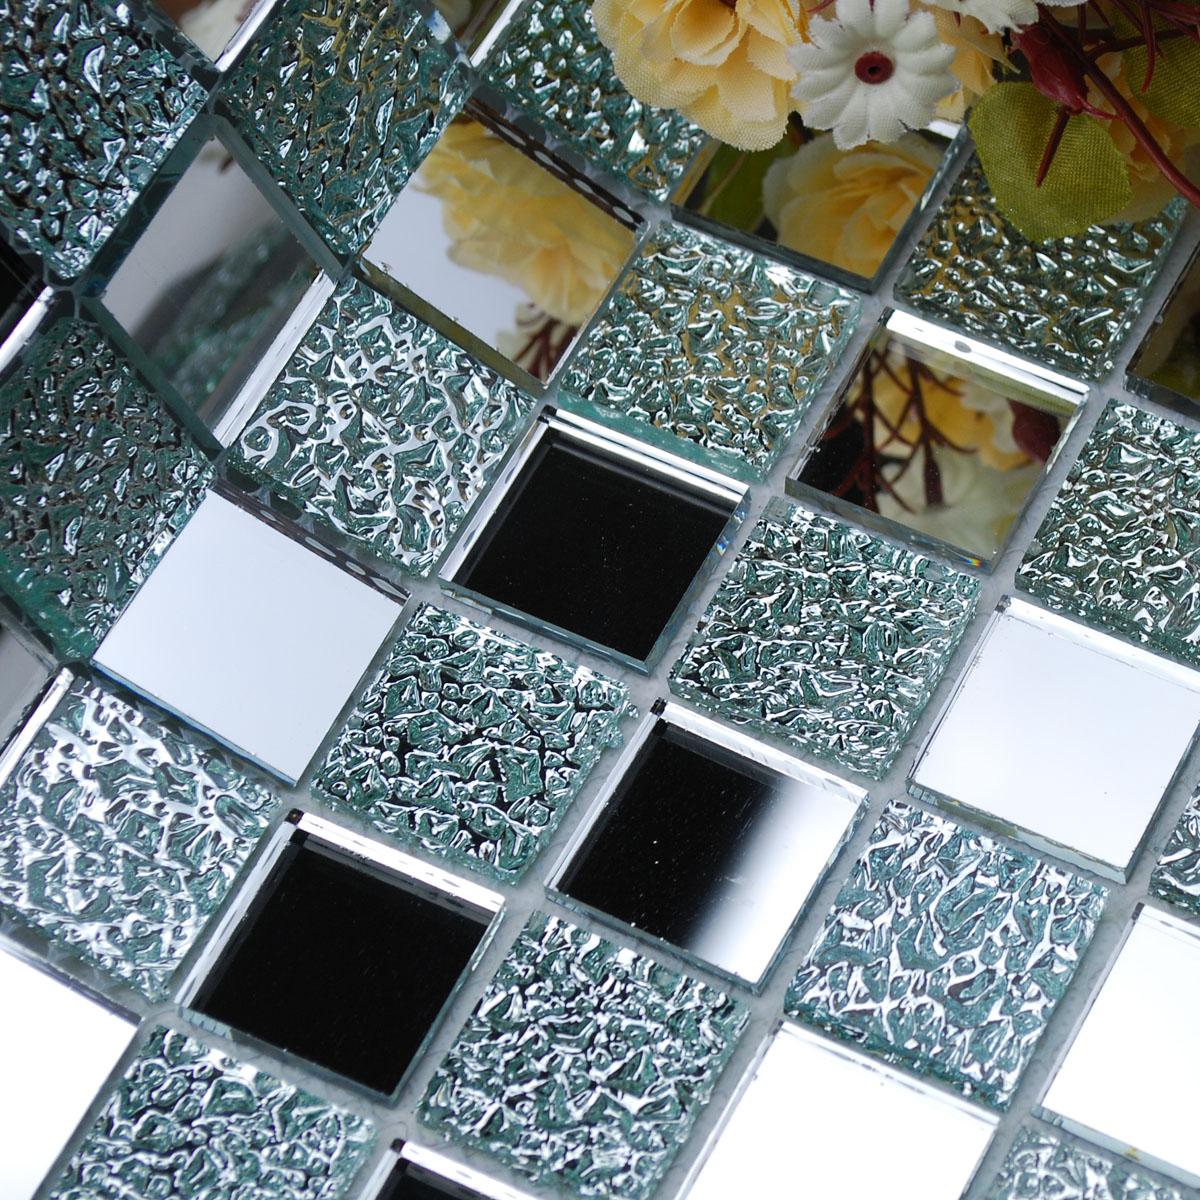 wholesale mirror tile squares blue bathroom mirrored wall tile backsplash 1 inch glass mosaic tiles decorative